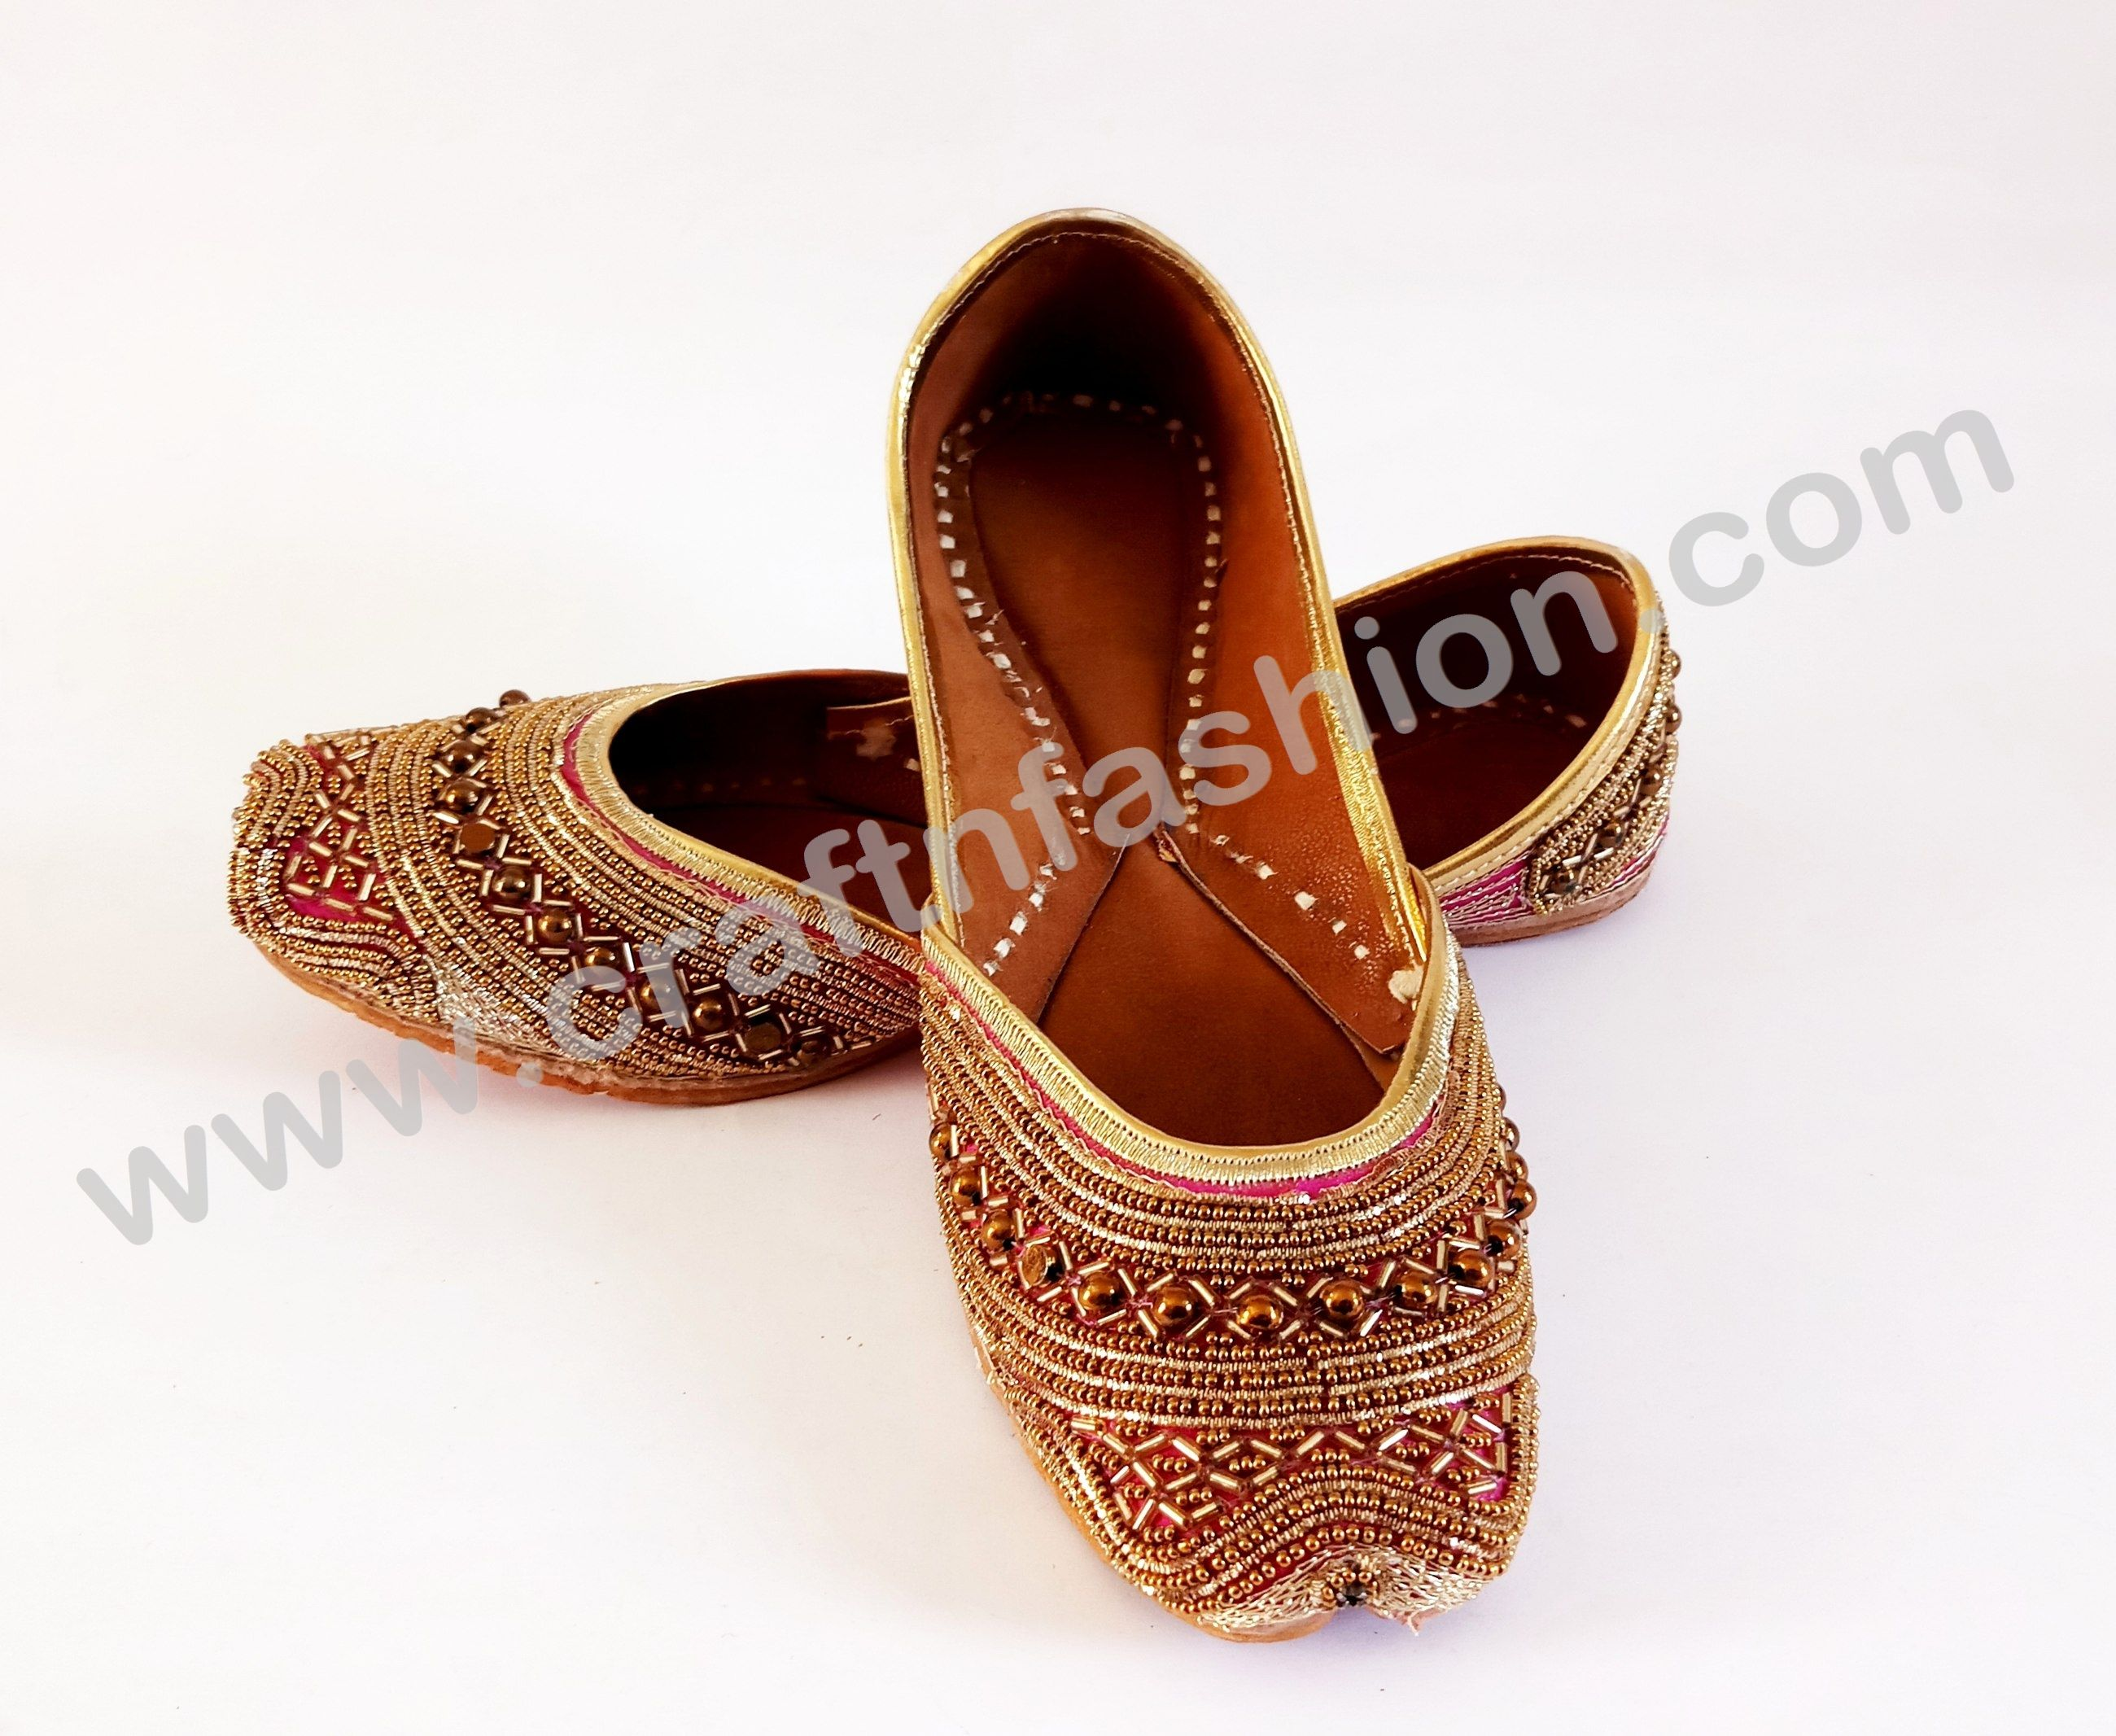 a95206c6ef11 Women's Zardosi Work Jutti - Exclusive Beaded Jutti - Punjabi Mojari- Megh  Craft | Clothing, Shoes & Accessories, Women's Shoes, Slippers | eBay!